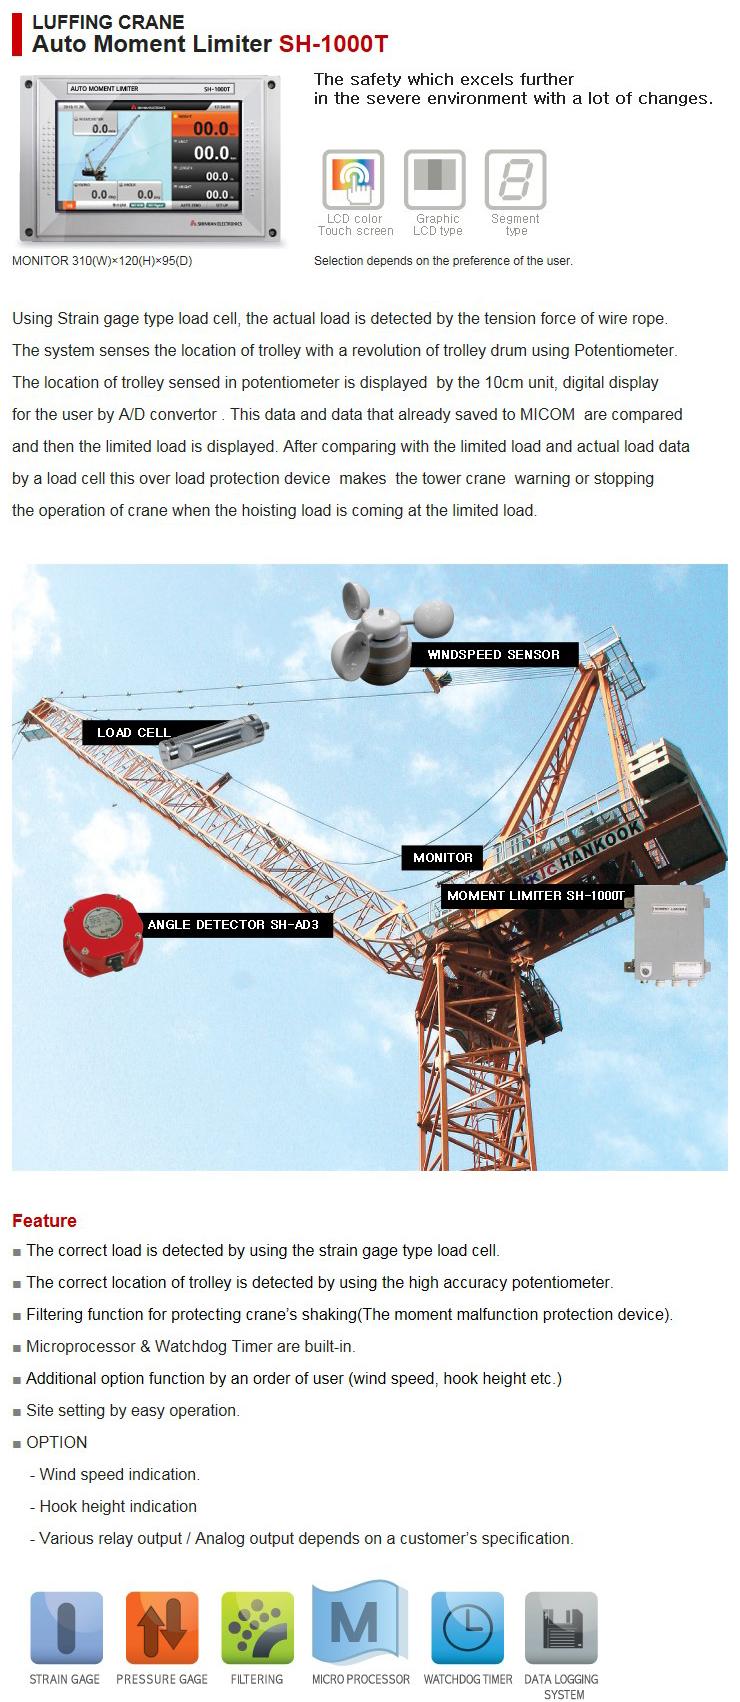 SHINHAN ELECTRIONICS Luffing Crane Auto Moment Limiter SH-1000T